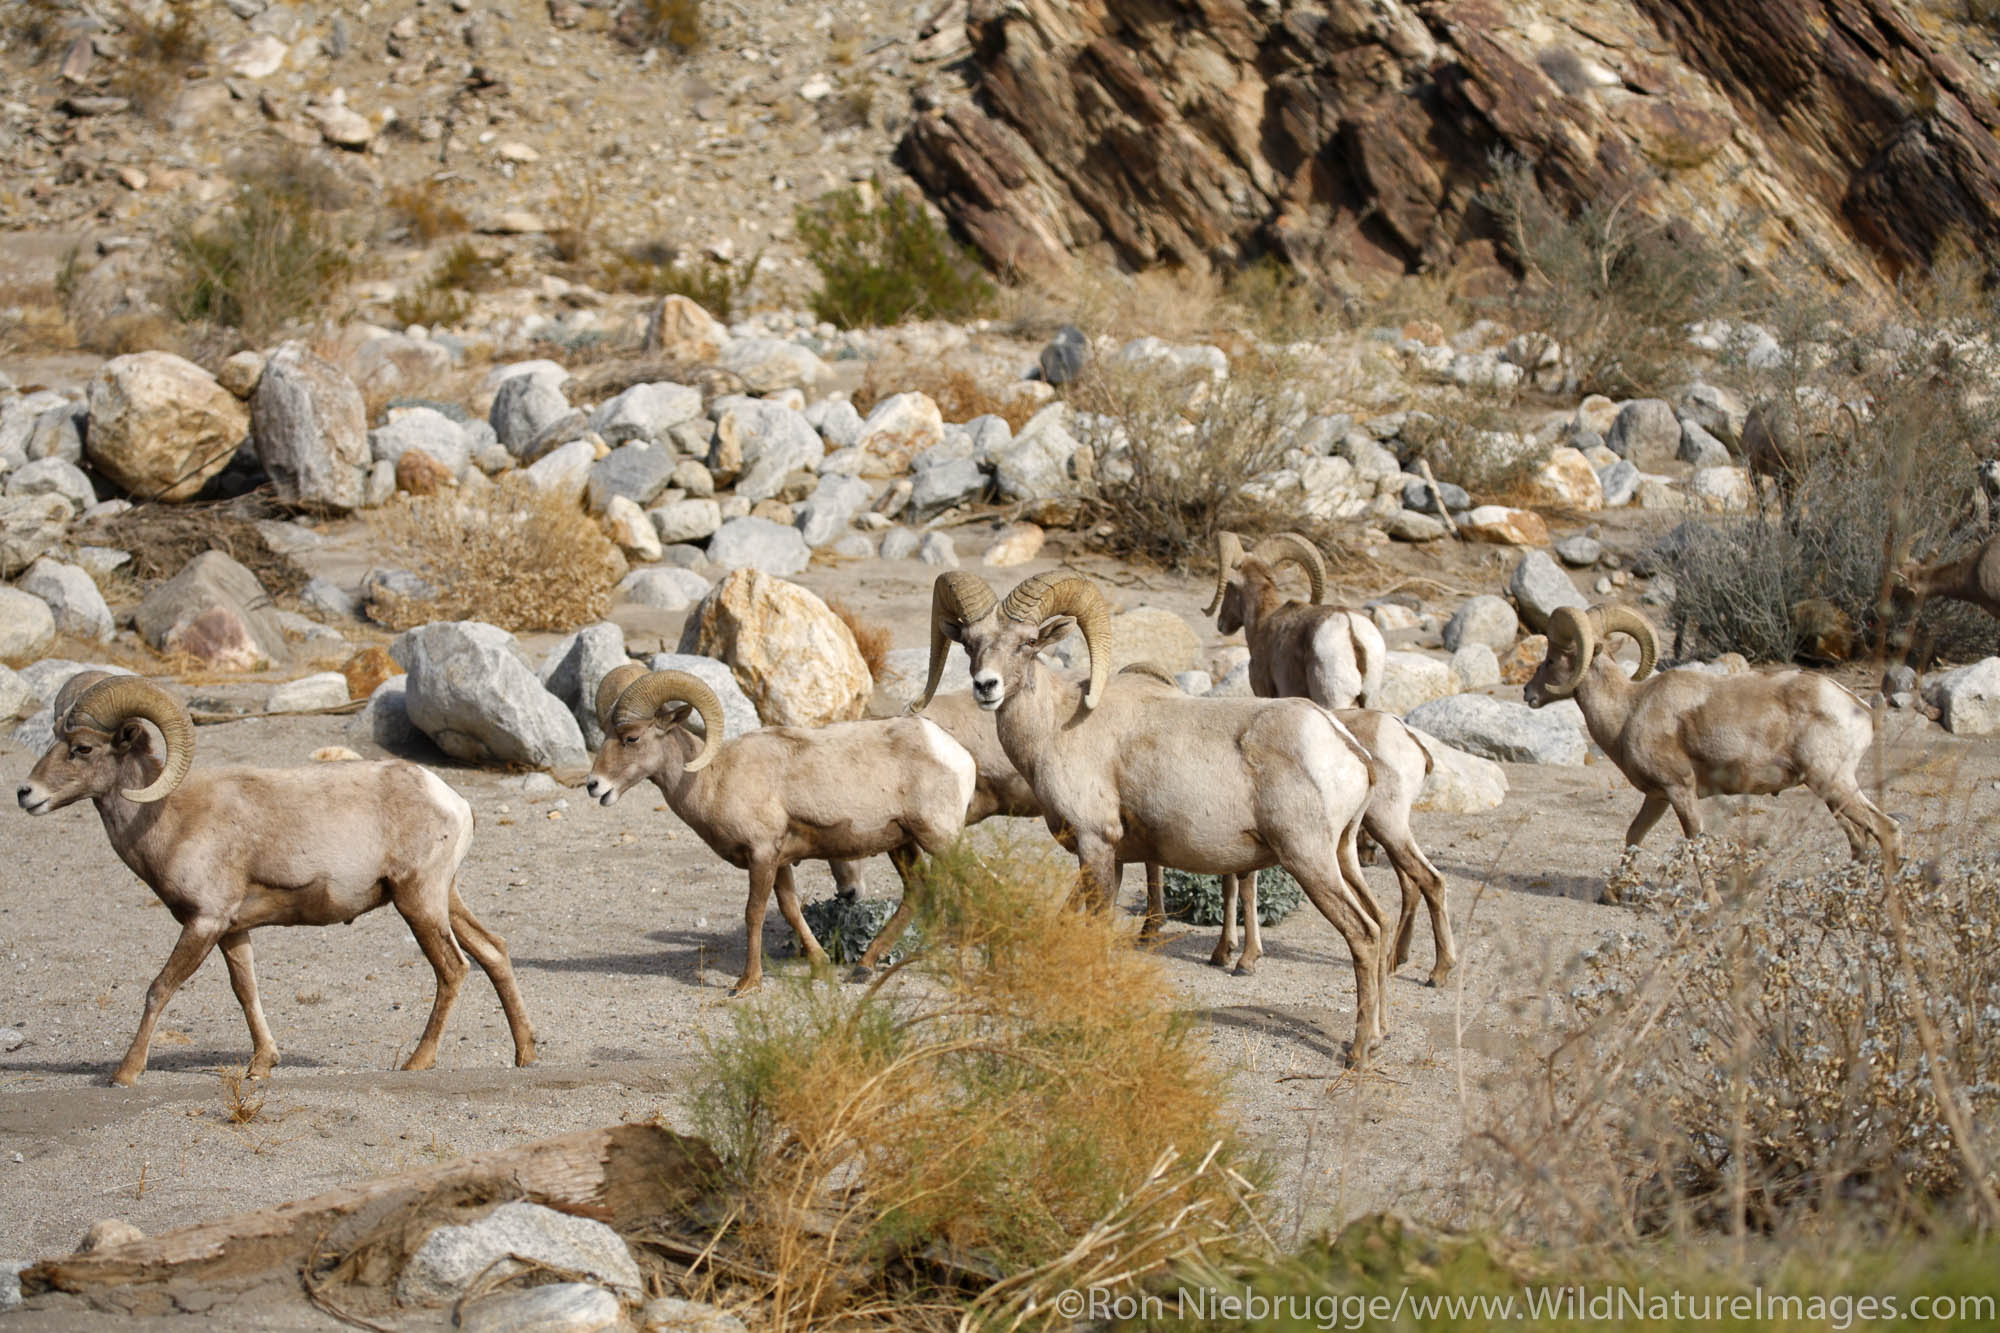 Peninsular Bighorn Sheep (Ovis canadensis cremnobates) Anza-Borrego Desert State Park, California.